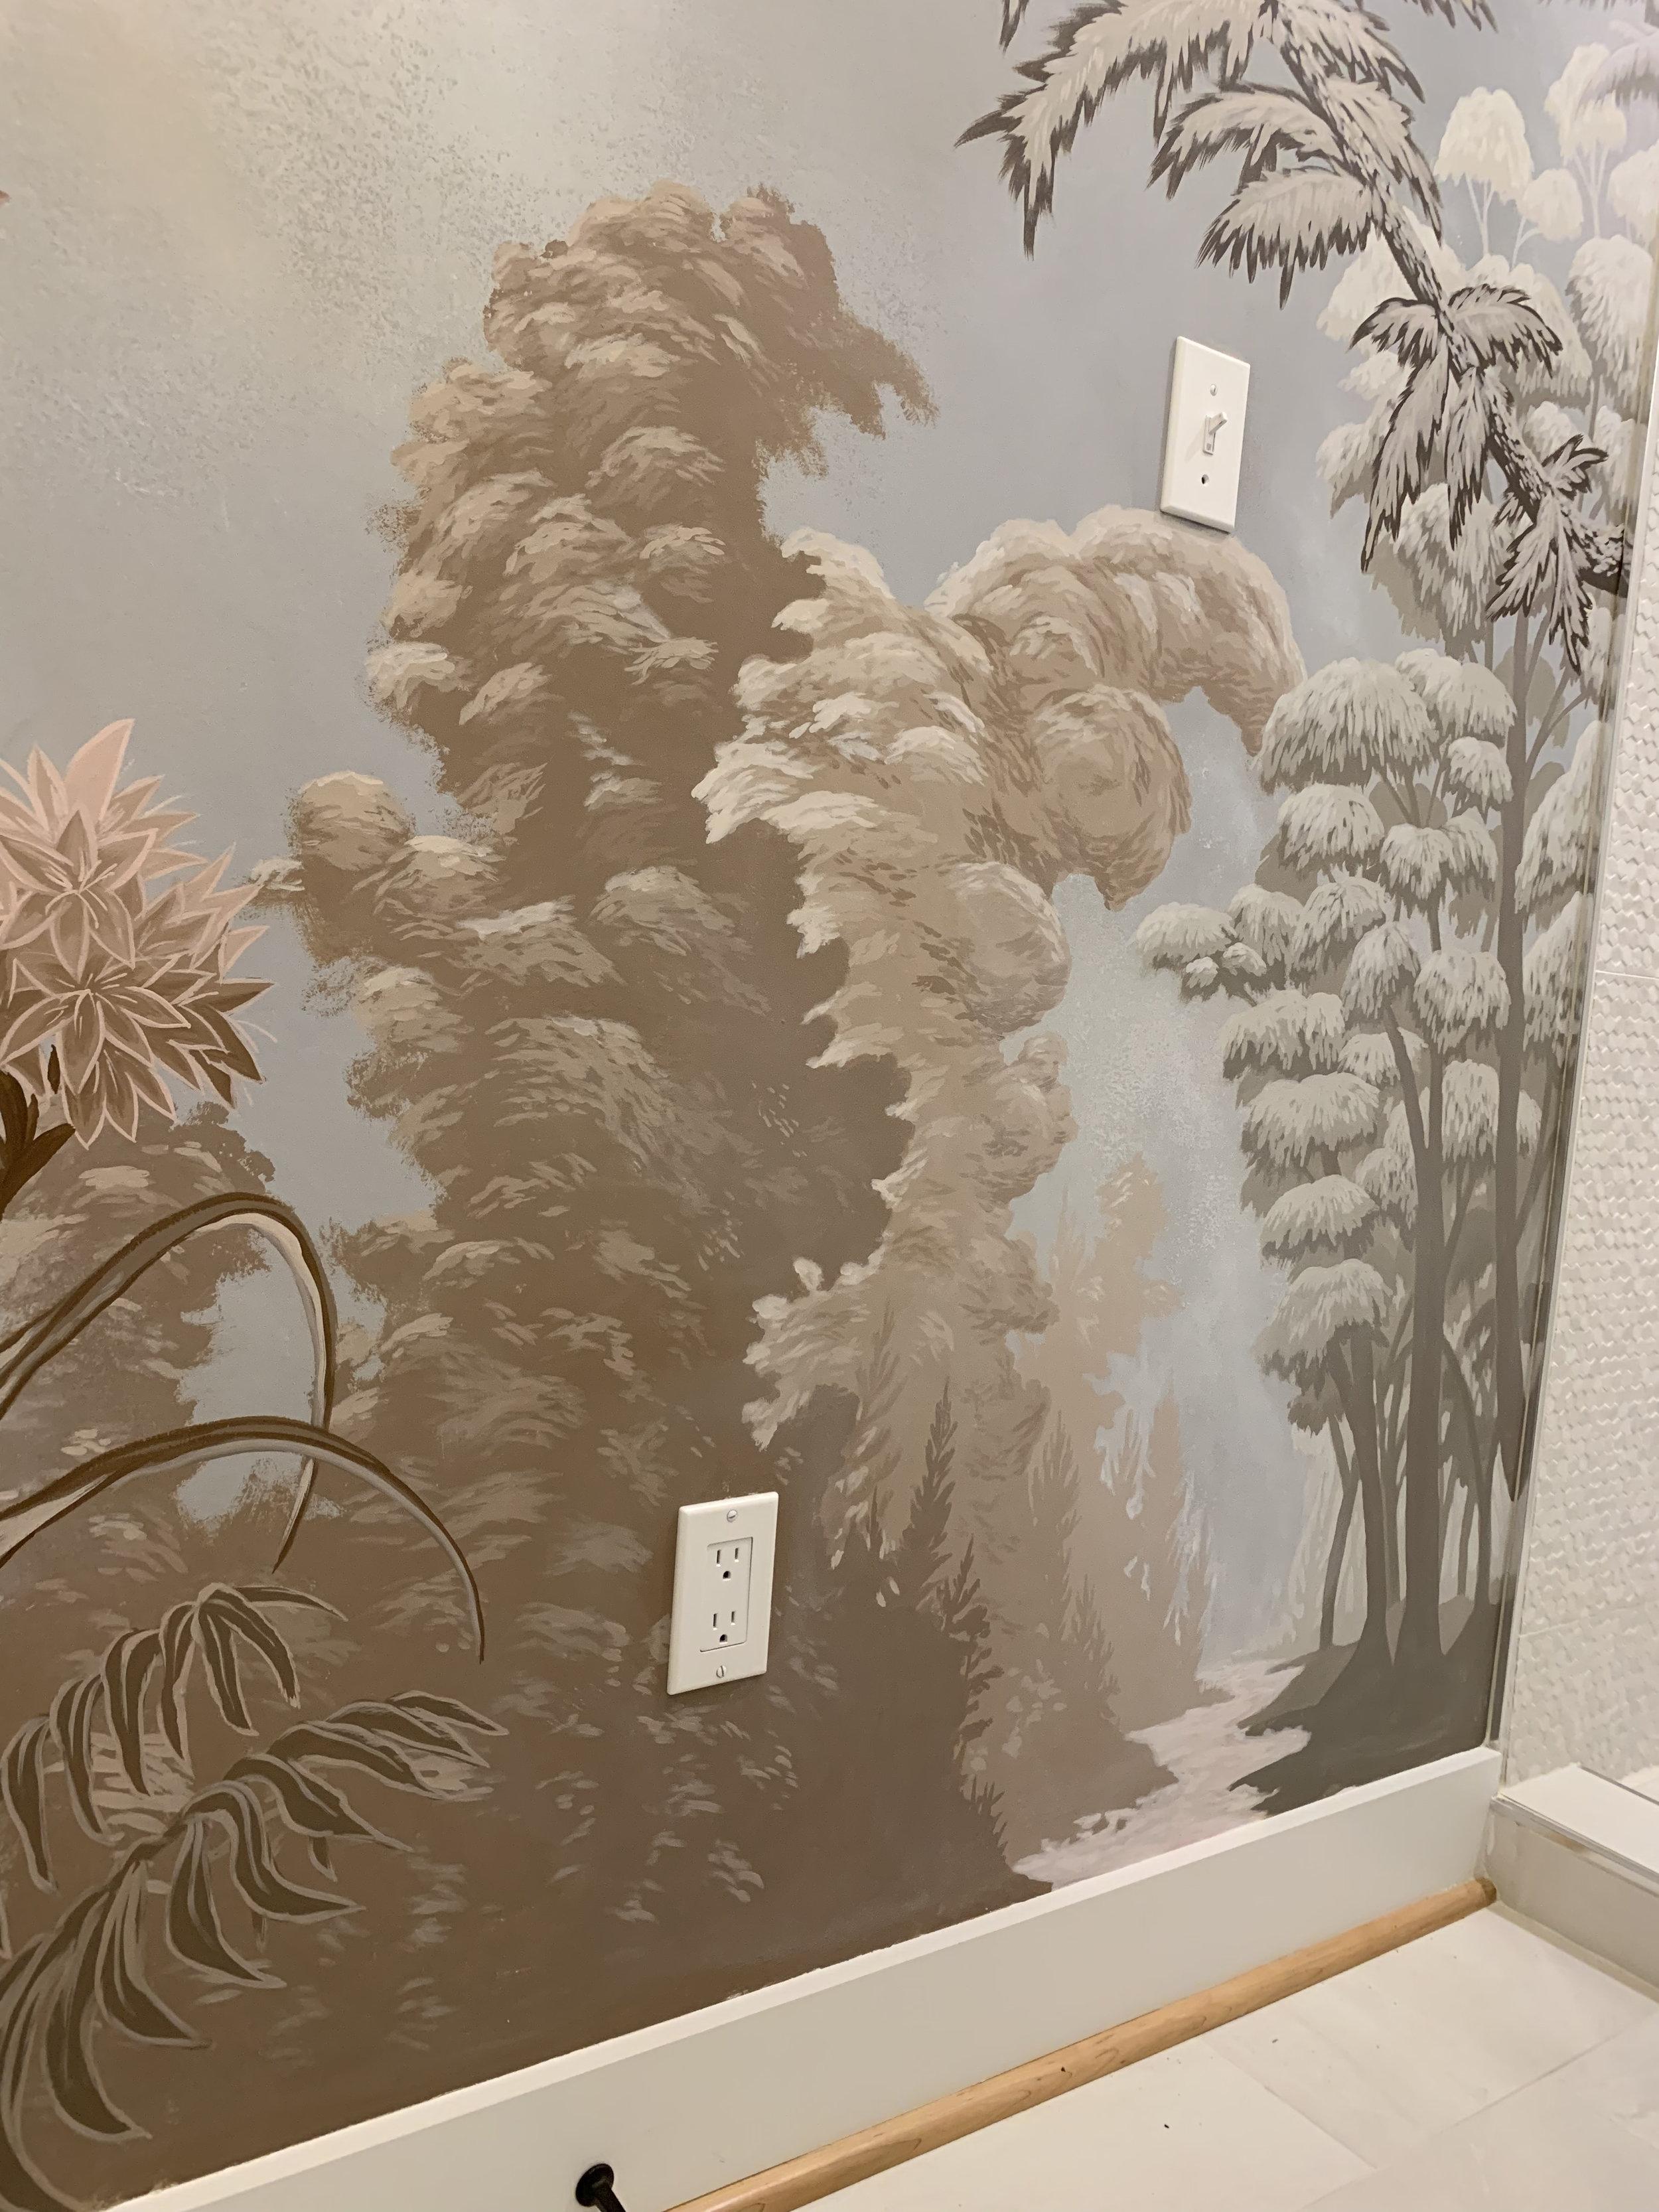 Mural_tropical2.jpg